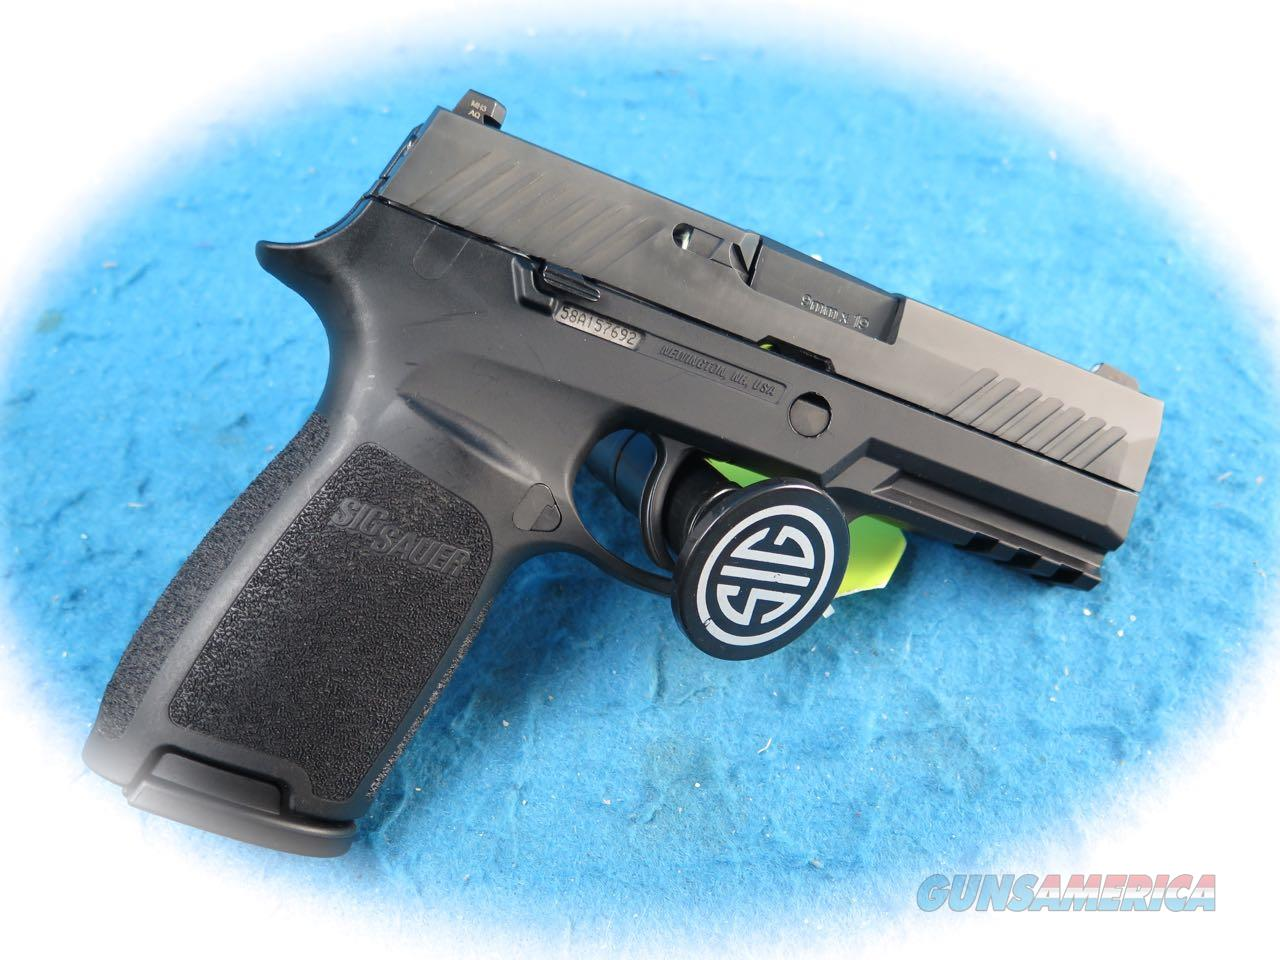 Sig Sauer P320 Nitron Carry 9mm Pistol Model 320CA-9-BSS **New**  Guns > Pistols > Sig - Sauer/Sigarms Pistols > P320